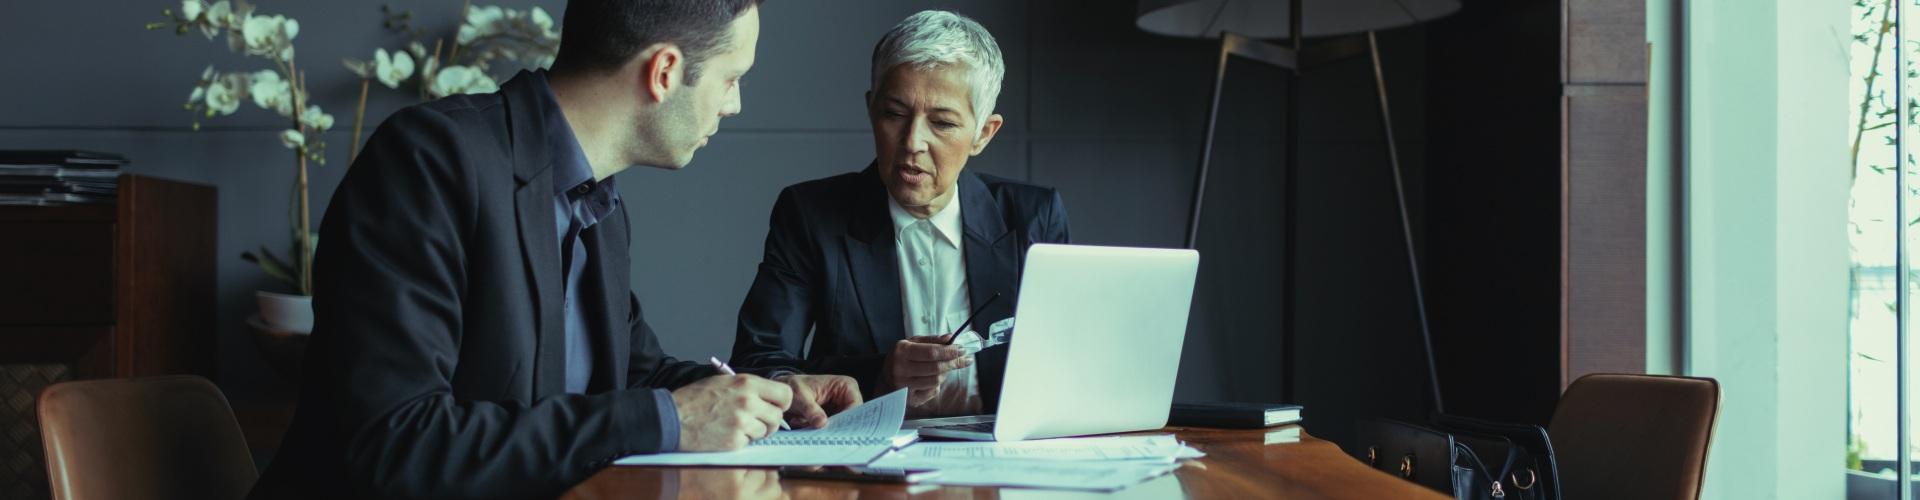 Support - Mi-Plan Financial Planning Software